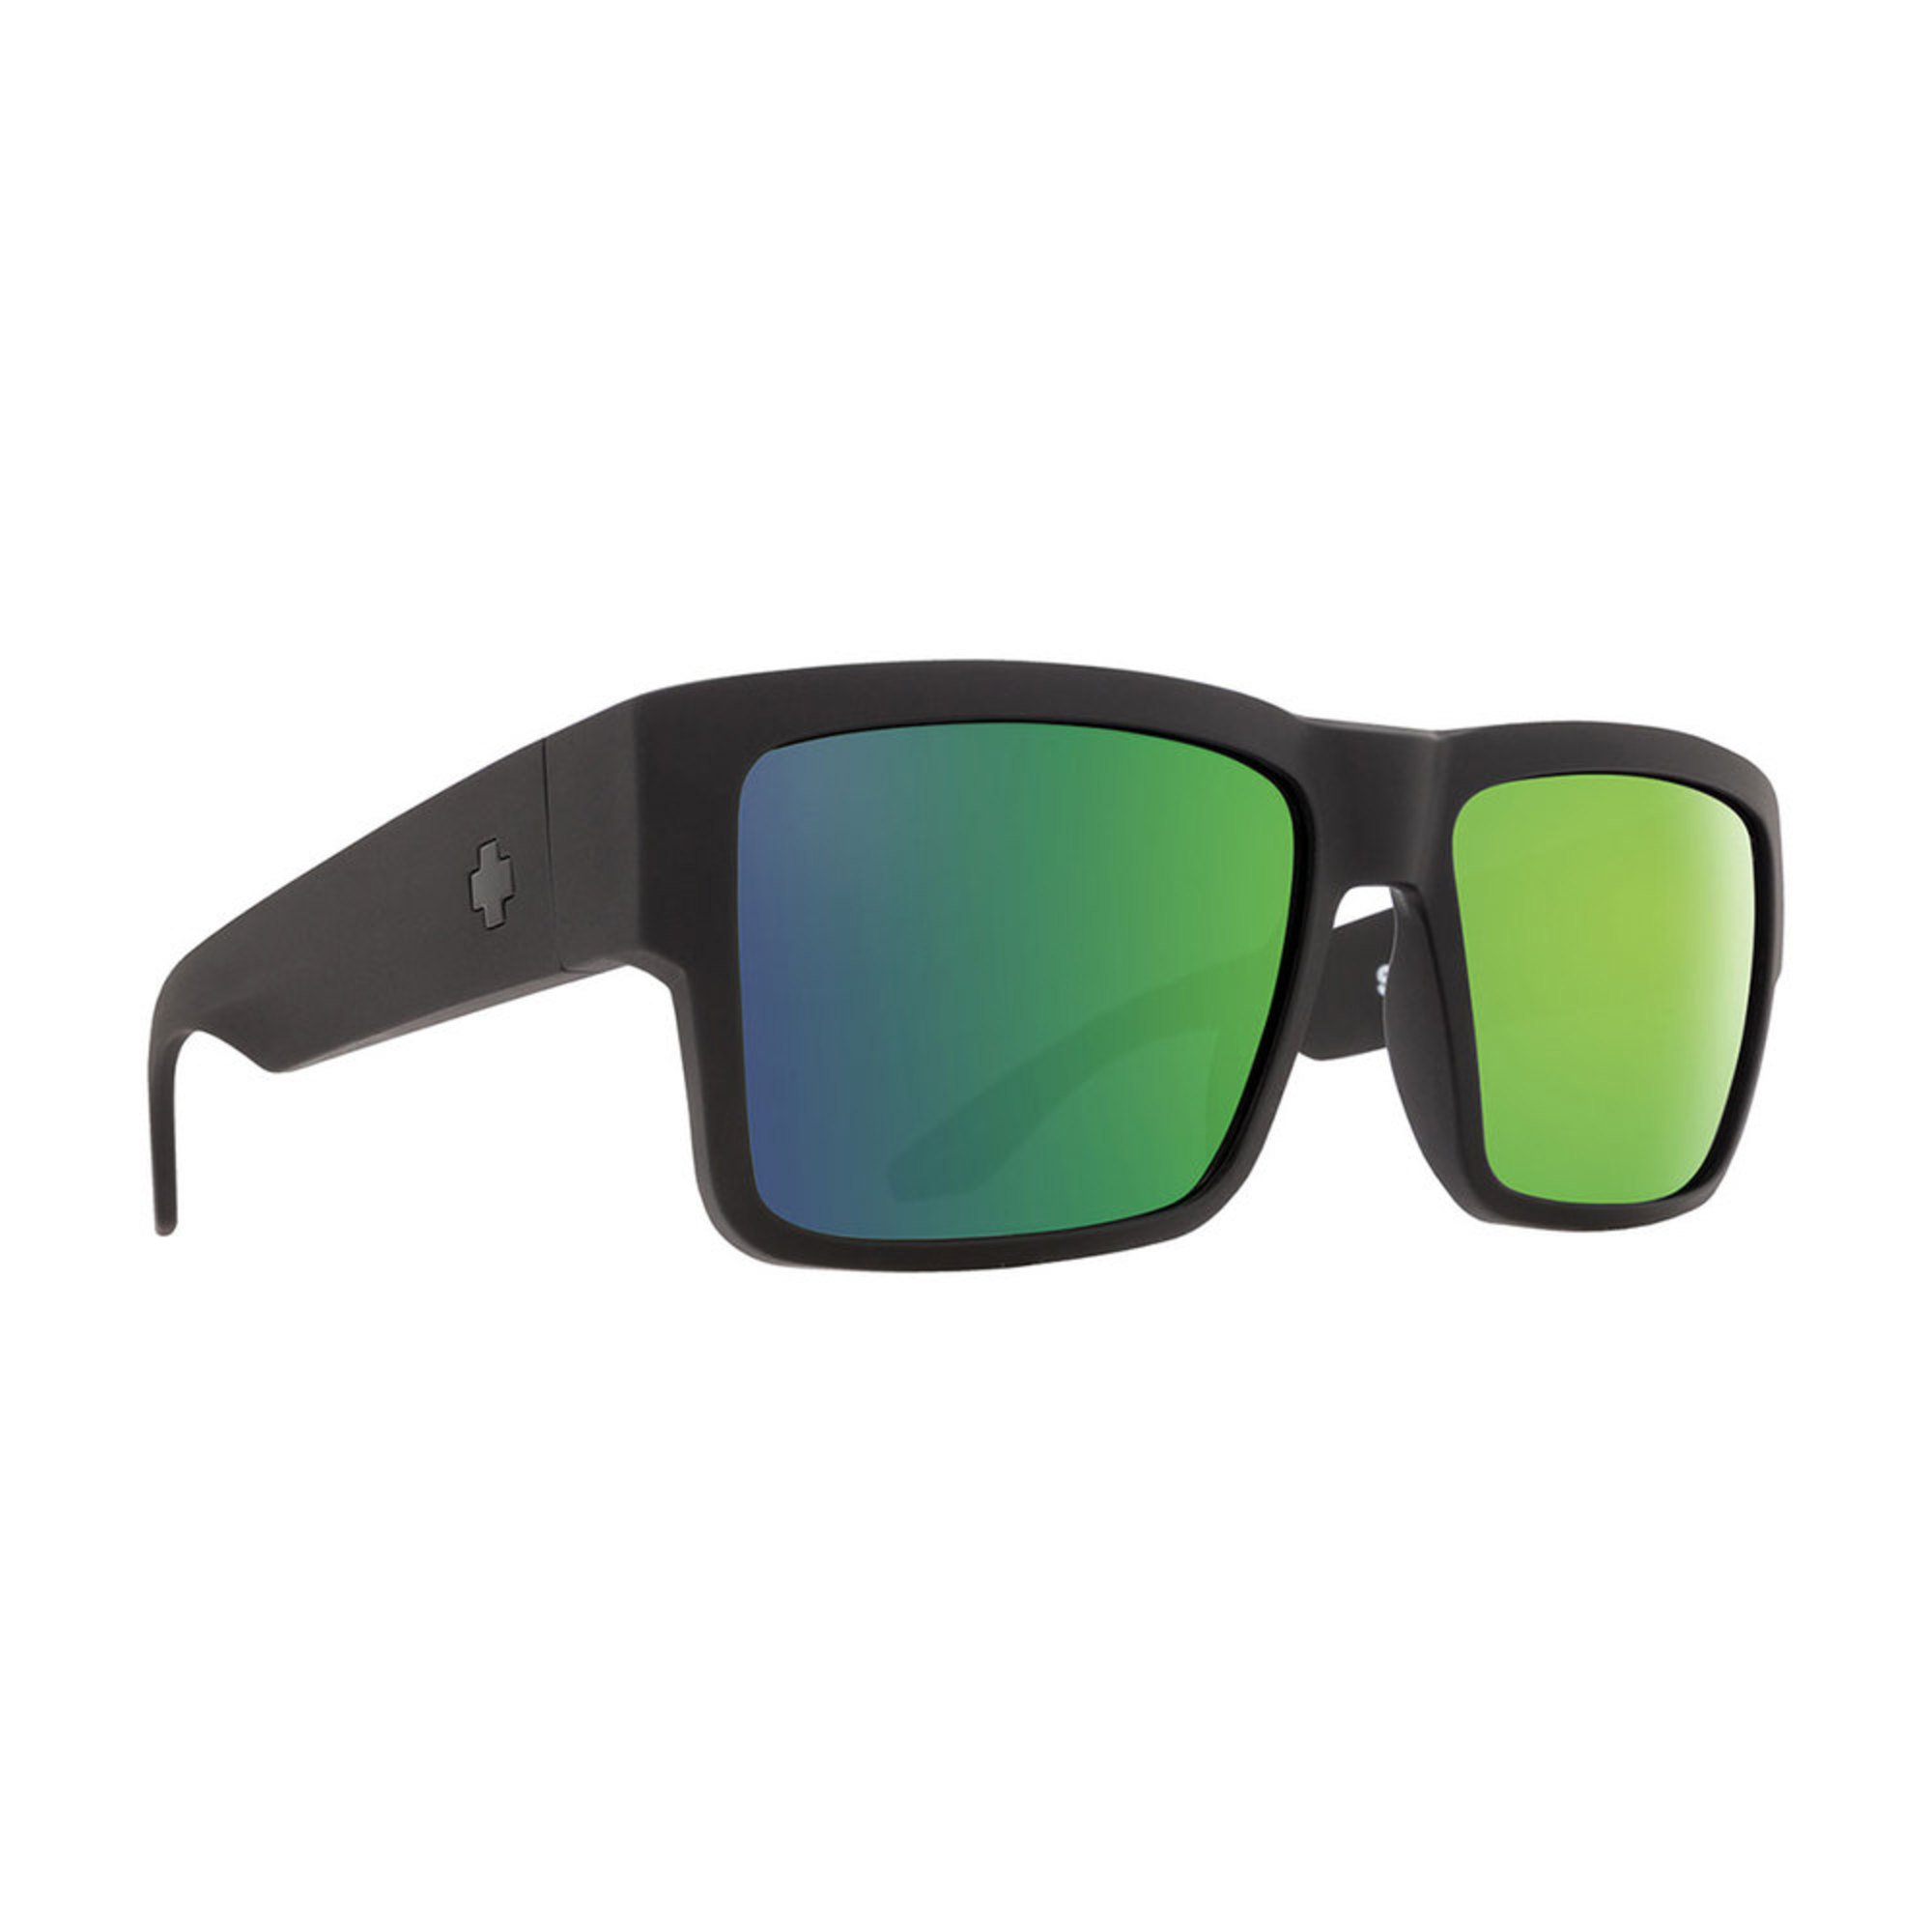 53ee3e20f3 Spy Optic. Spy Optic Men s Polarized Cyrus Rectangular Sunglasses